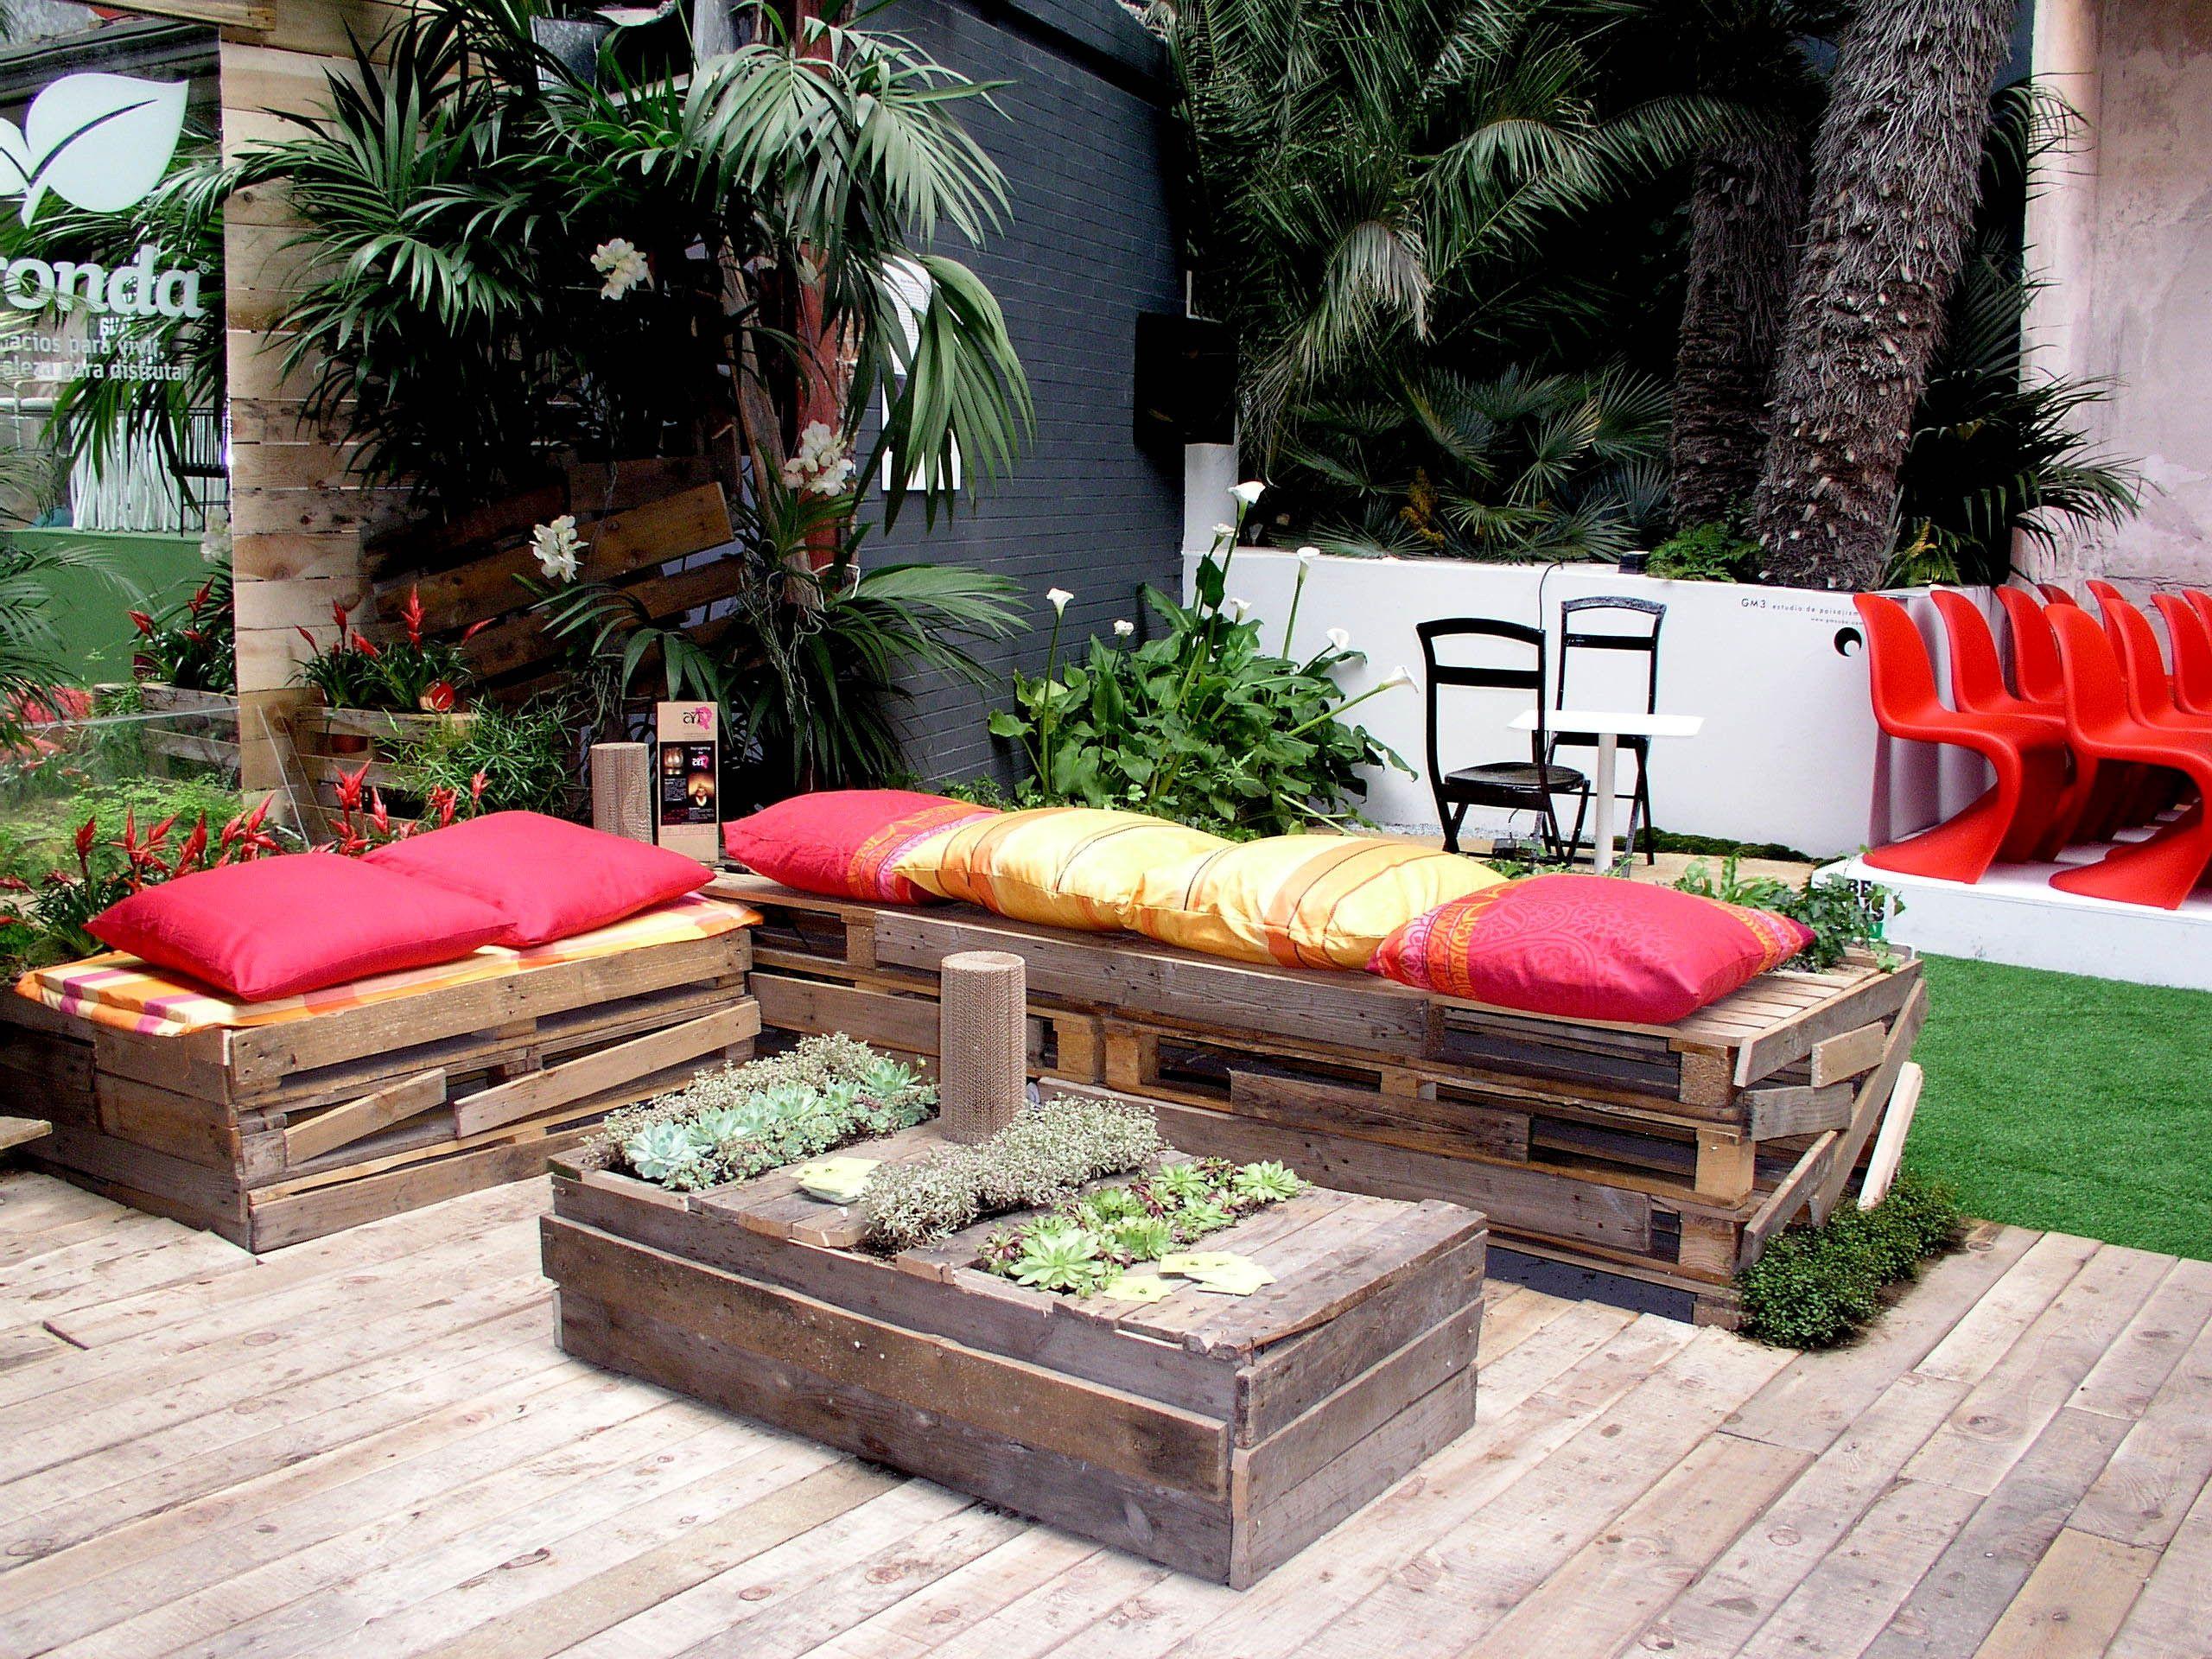 Muebles para jard n o terraza palets muebles con - Muebles de terraza con palets ...